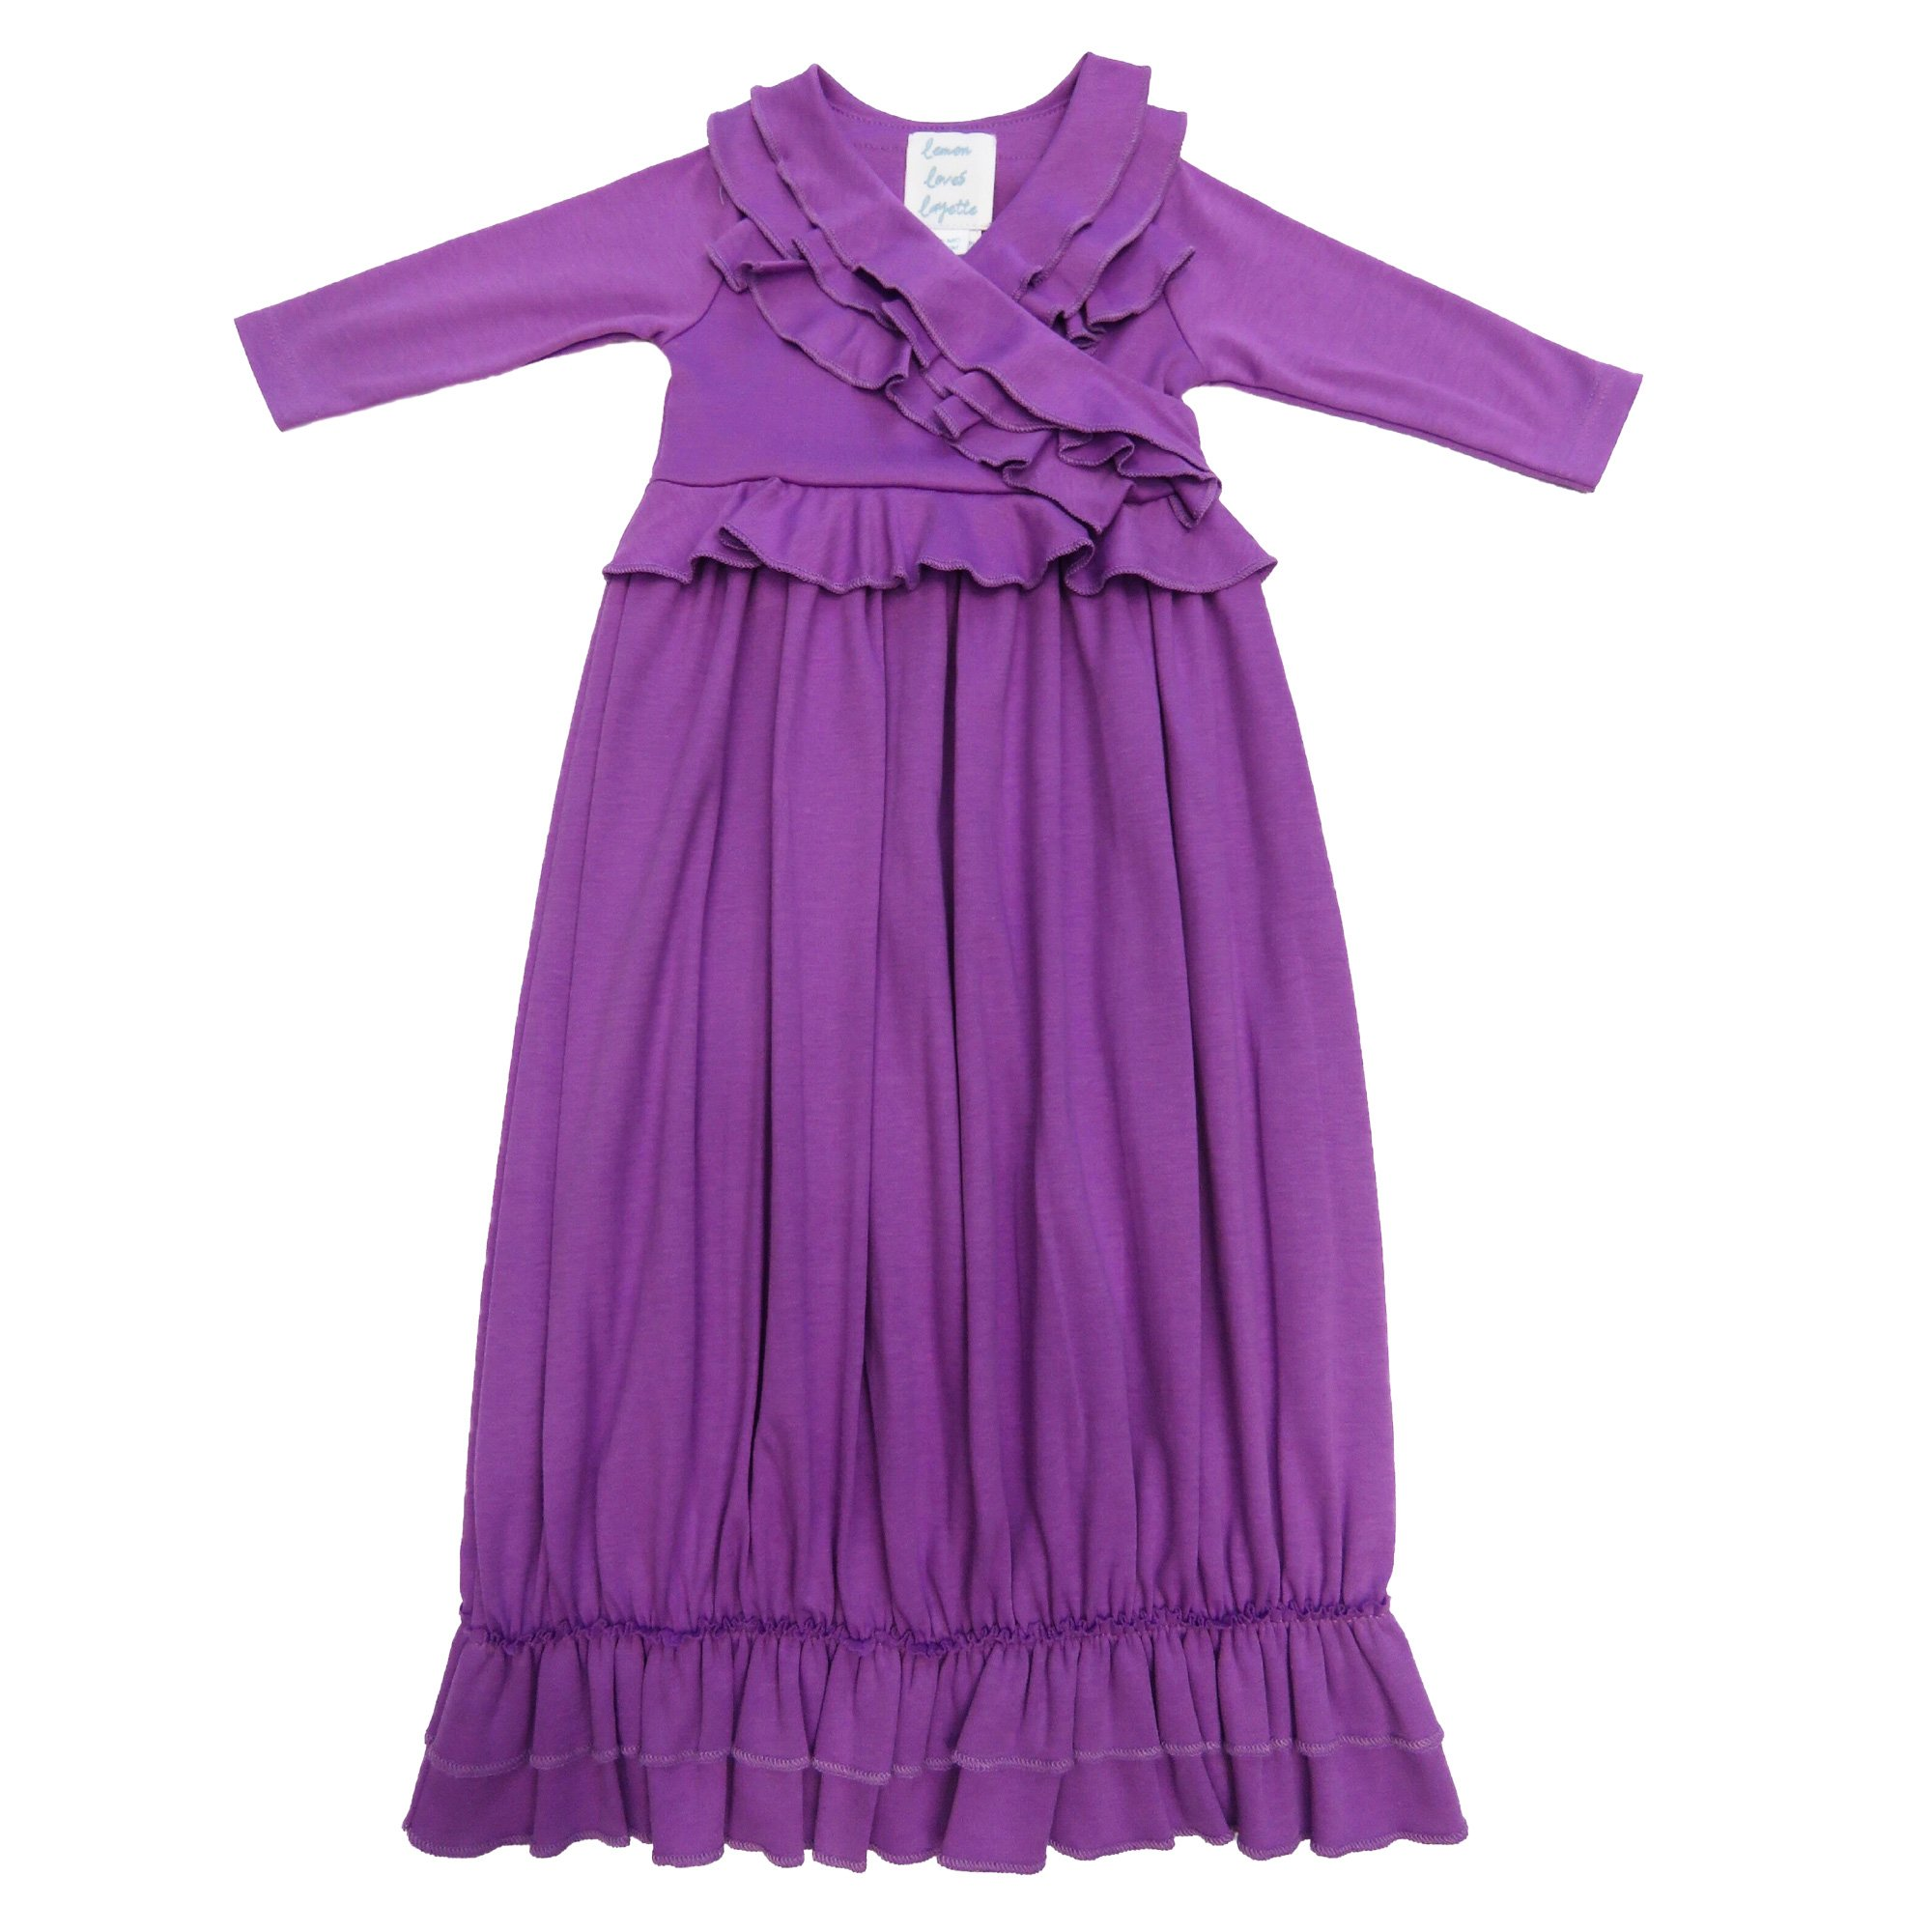 Newborn Gown-Lemon Loves Layette-Jenna